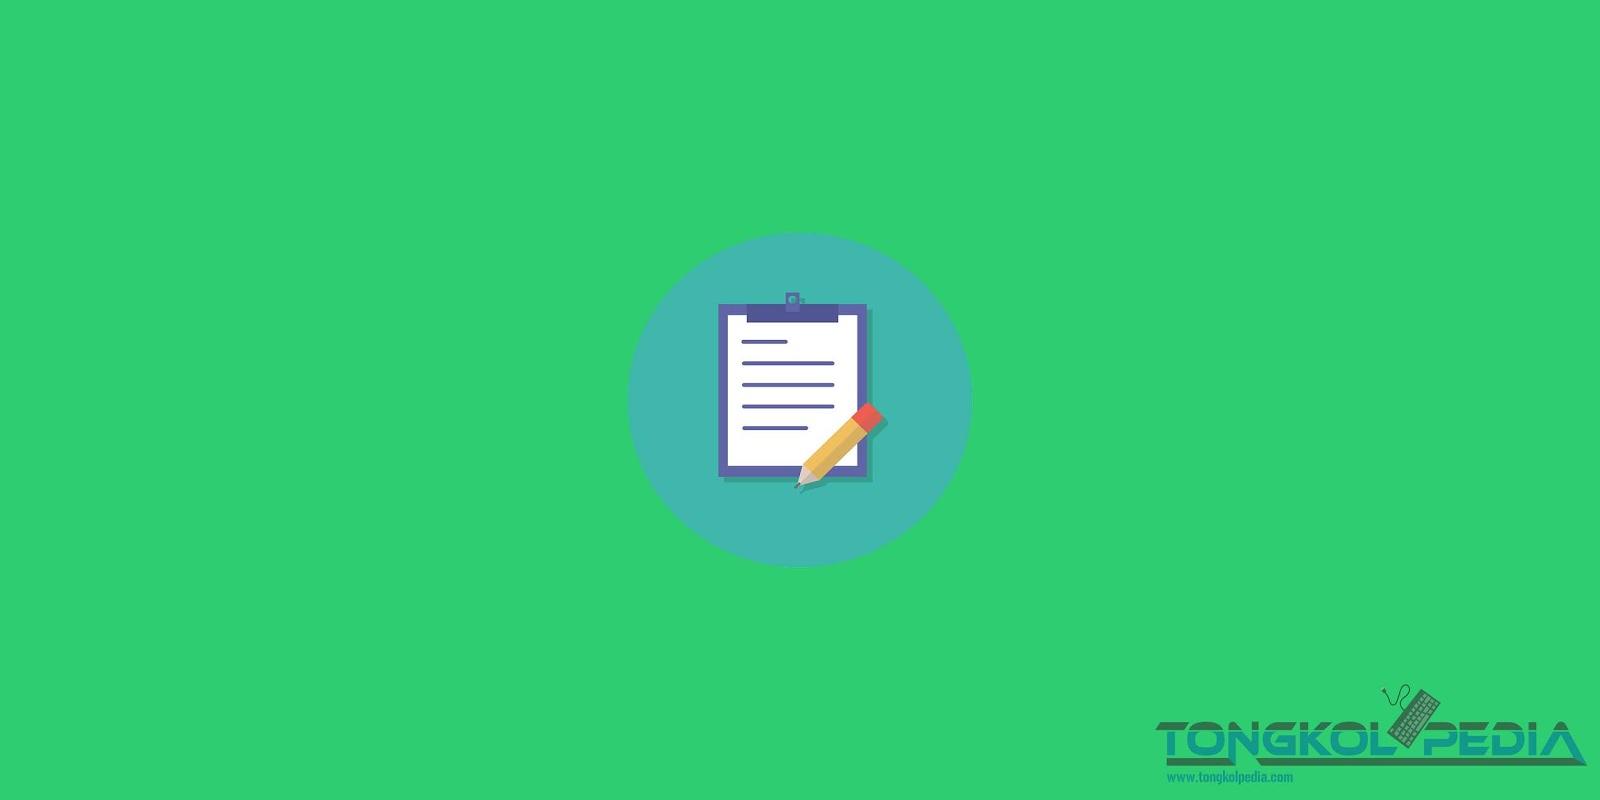 Cara Membuat Note Berwarna di Blogger Dengan Mudah